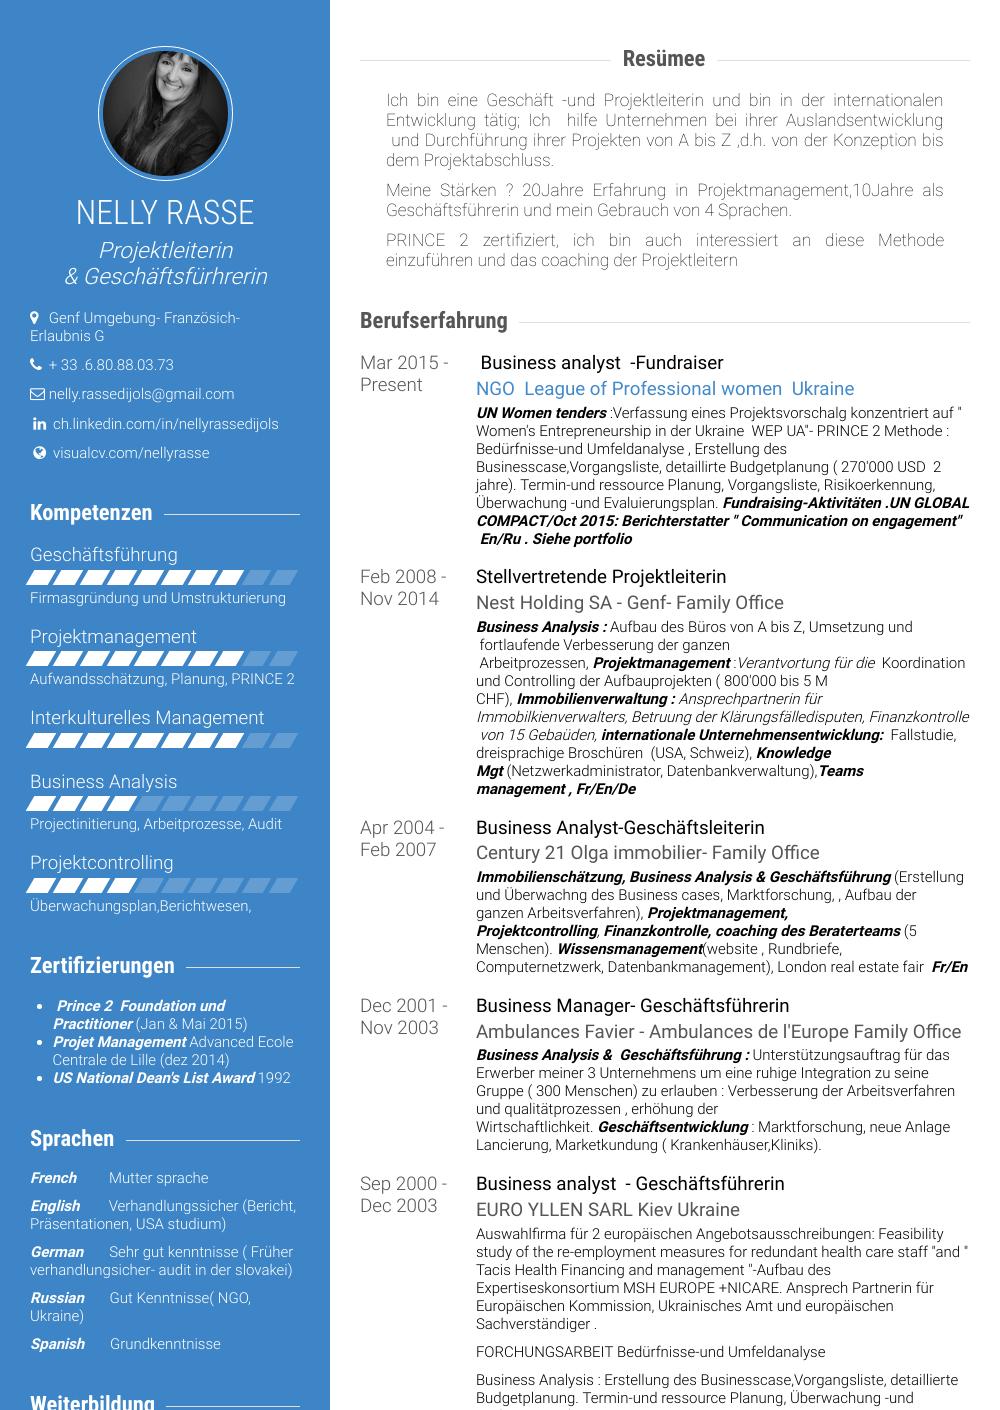 Analyst - Resume Samples & Templates | VisualCV